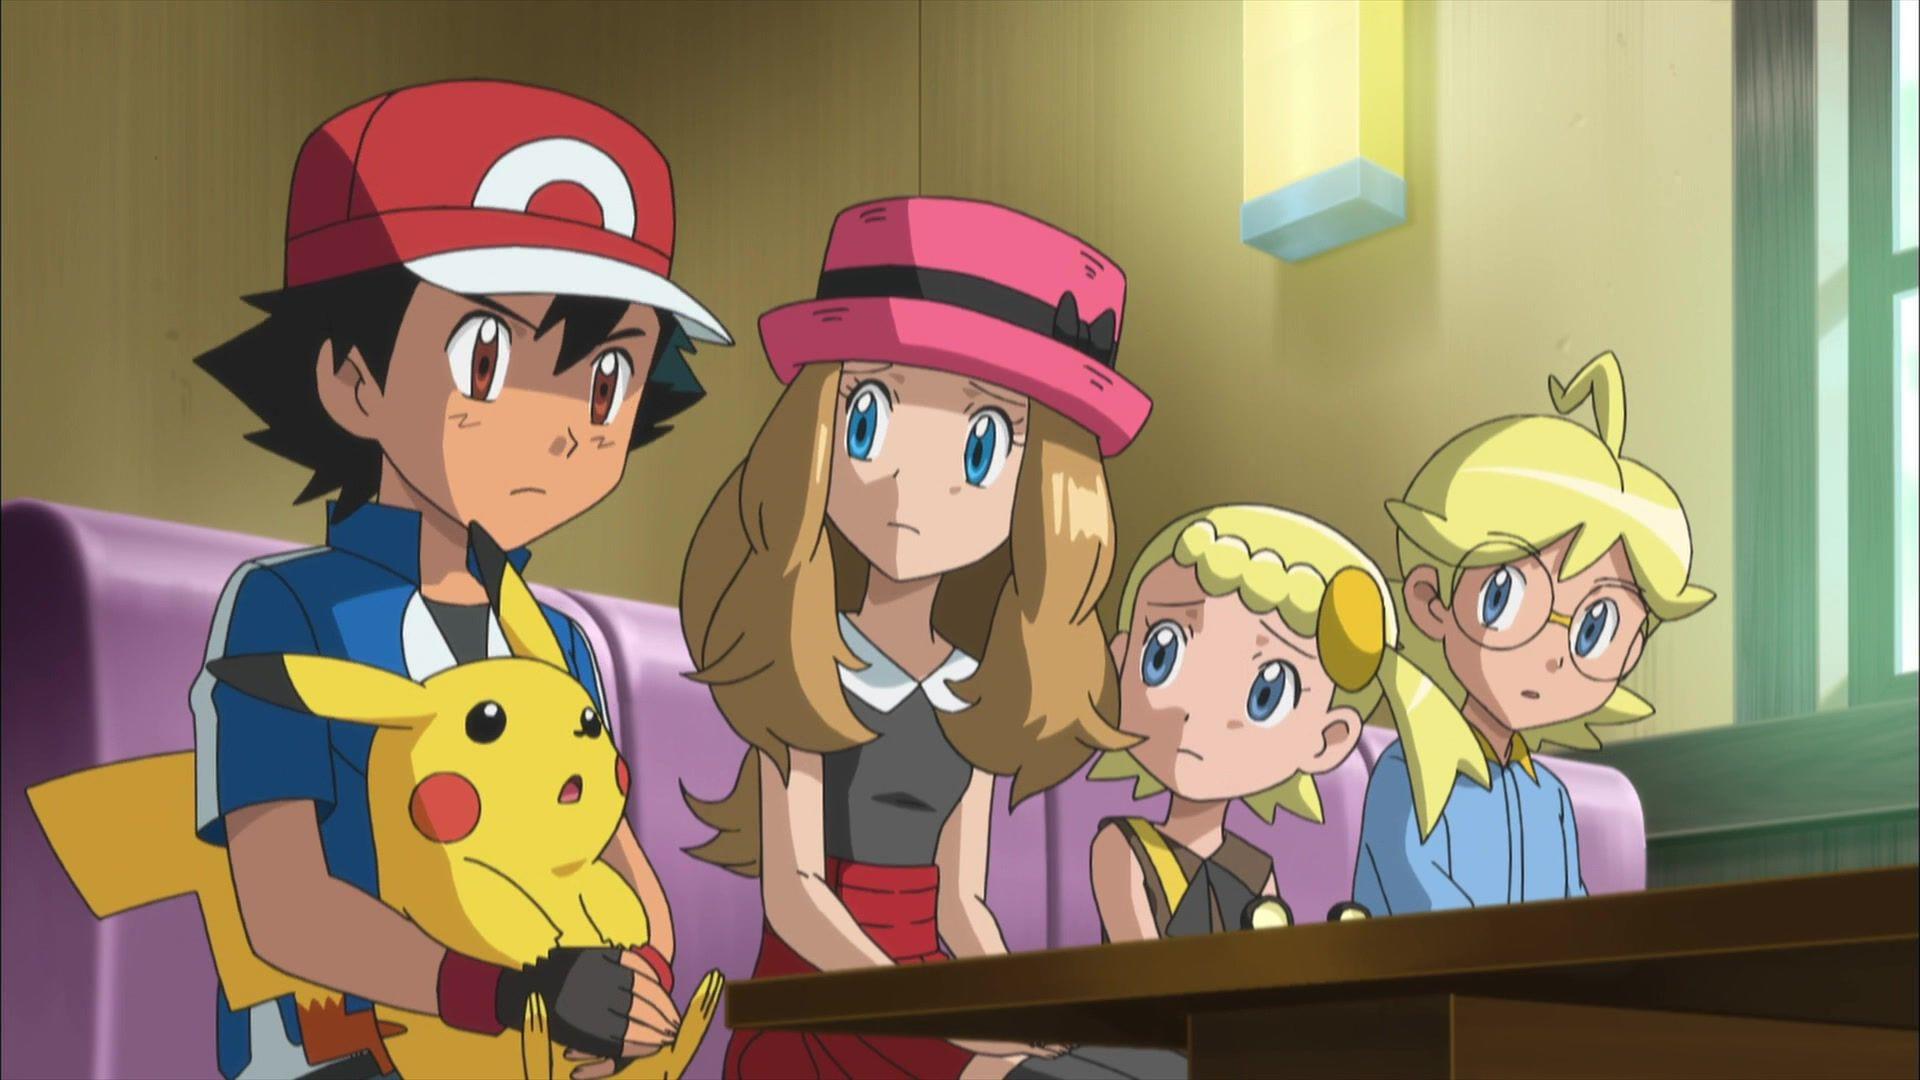 Anime Screencap and Image For Pokemon: XY  Fancaps.net